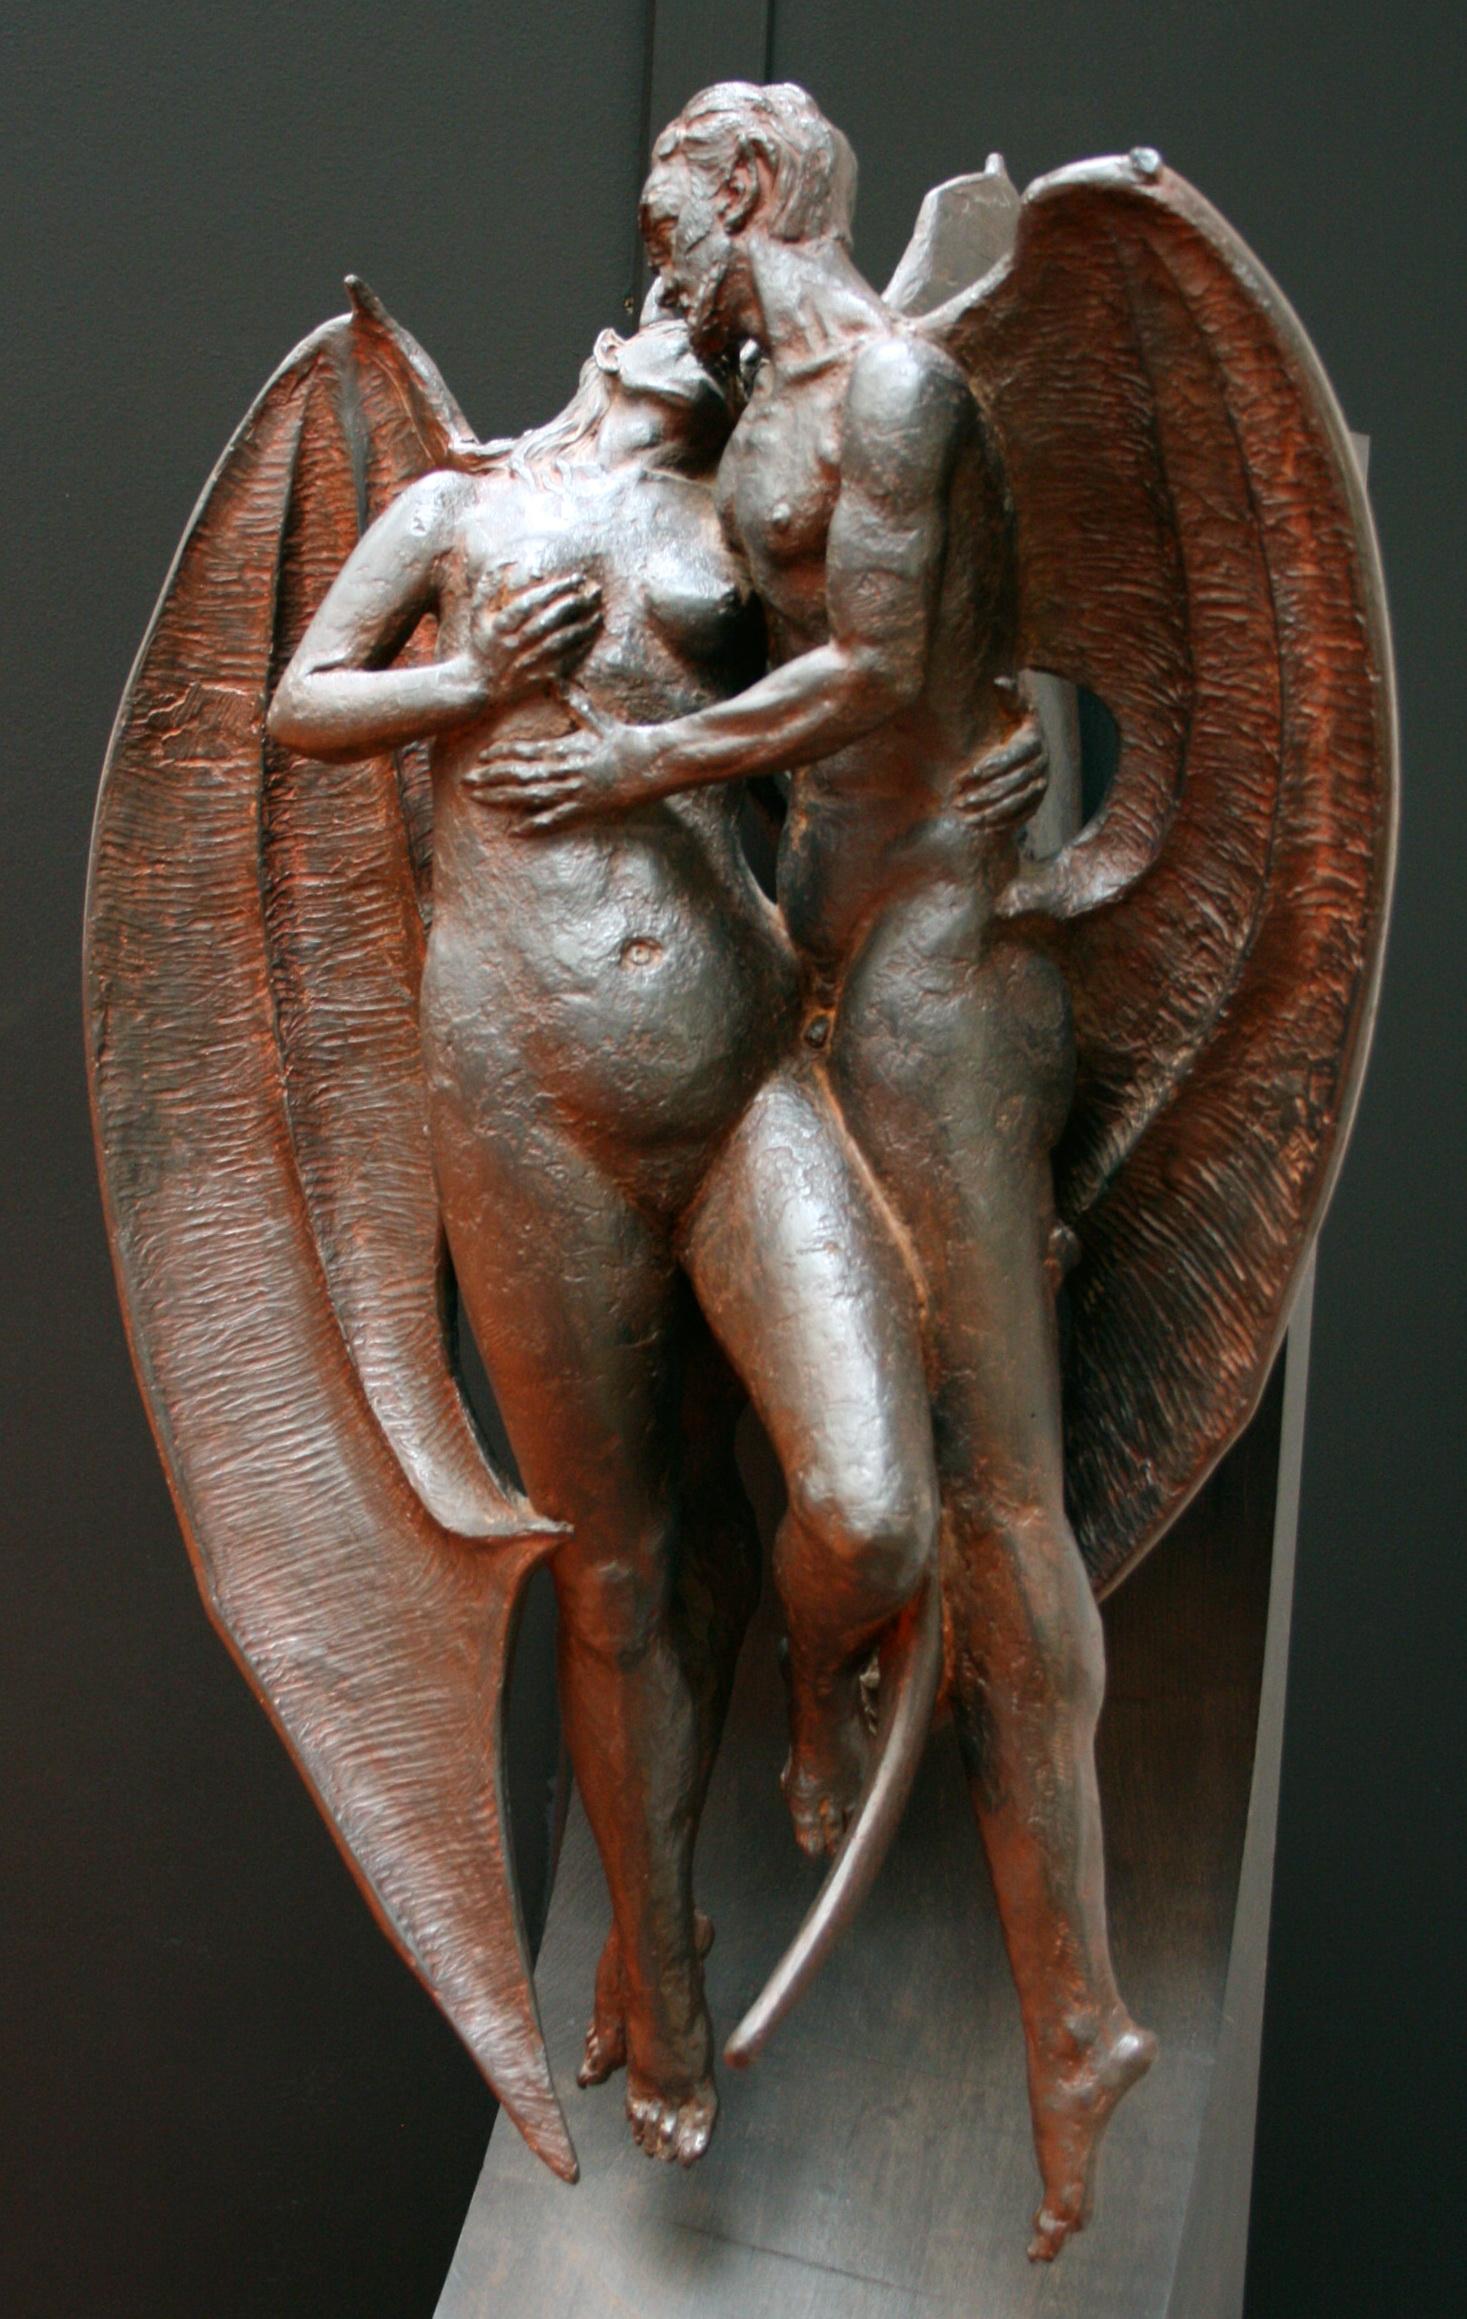 Demoni e la loro Gerarchia